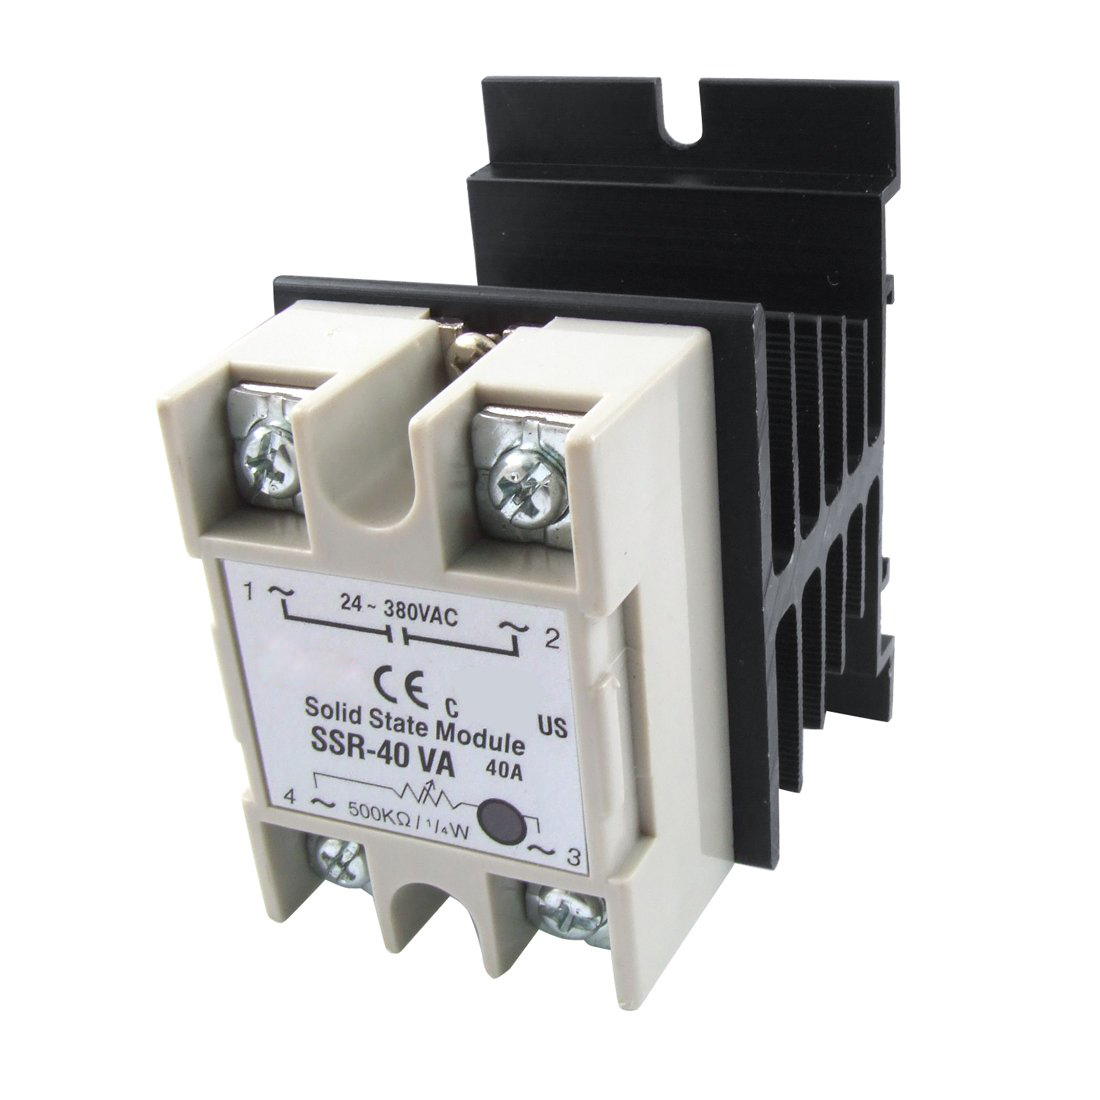 LHLL- VolTage Resistance Regulator Solid State Relay SSR 40A 24-380V AC w Heat SInk